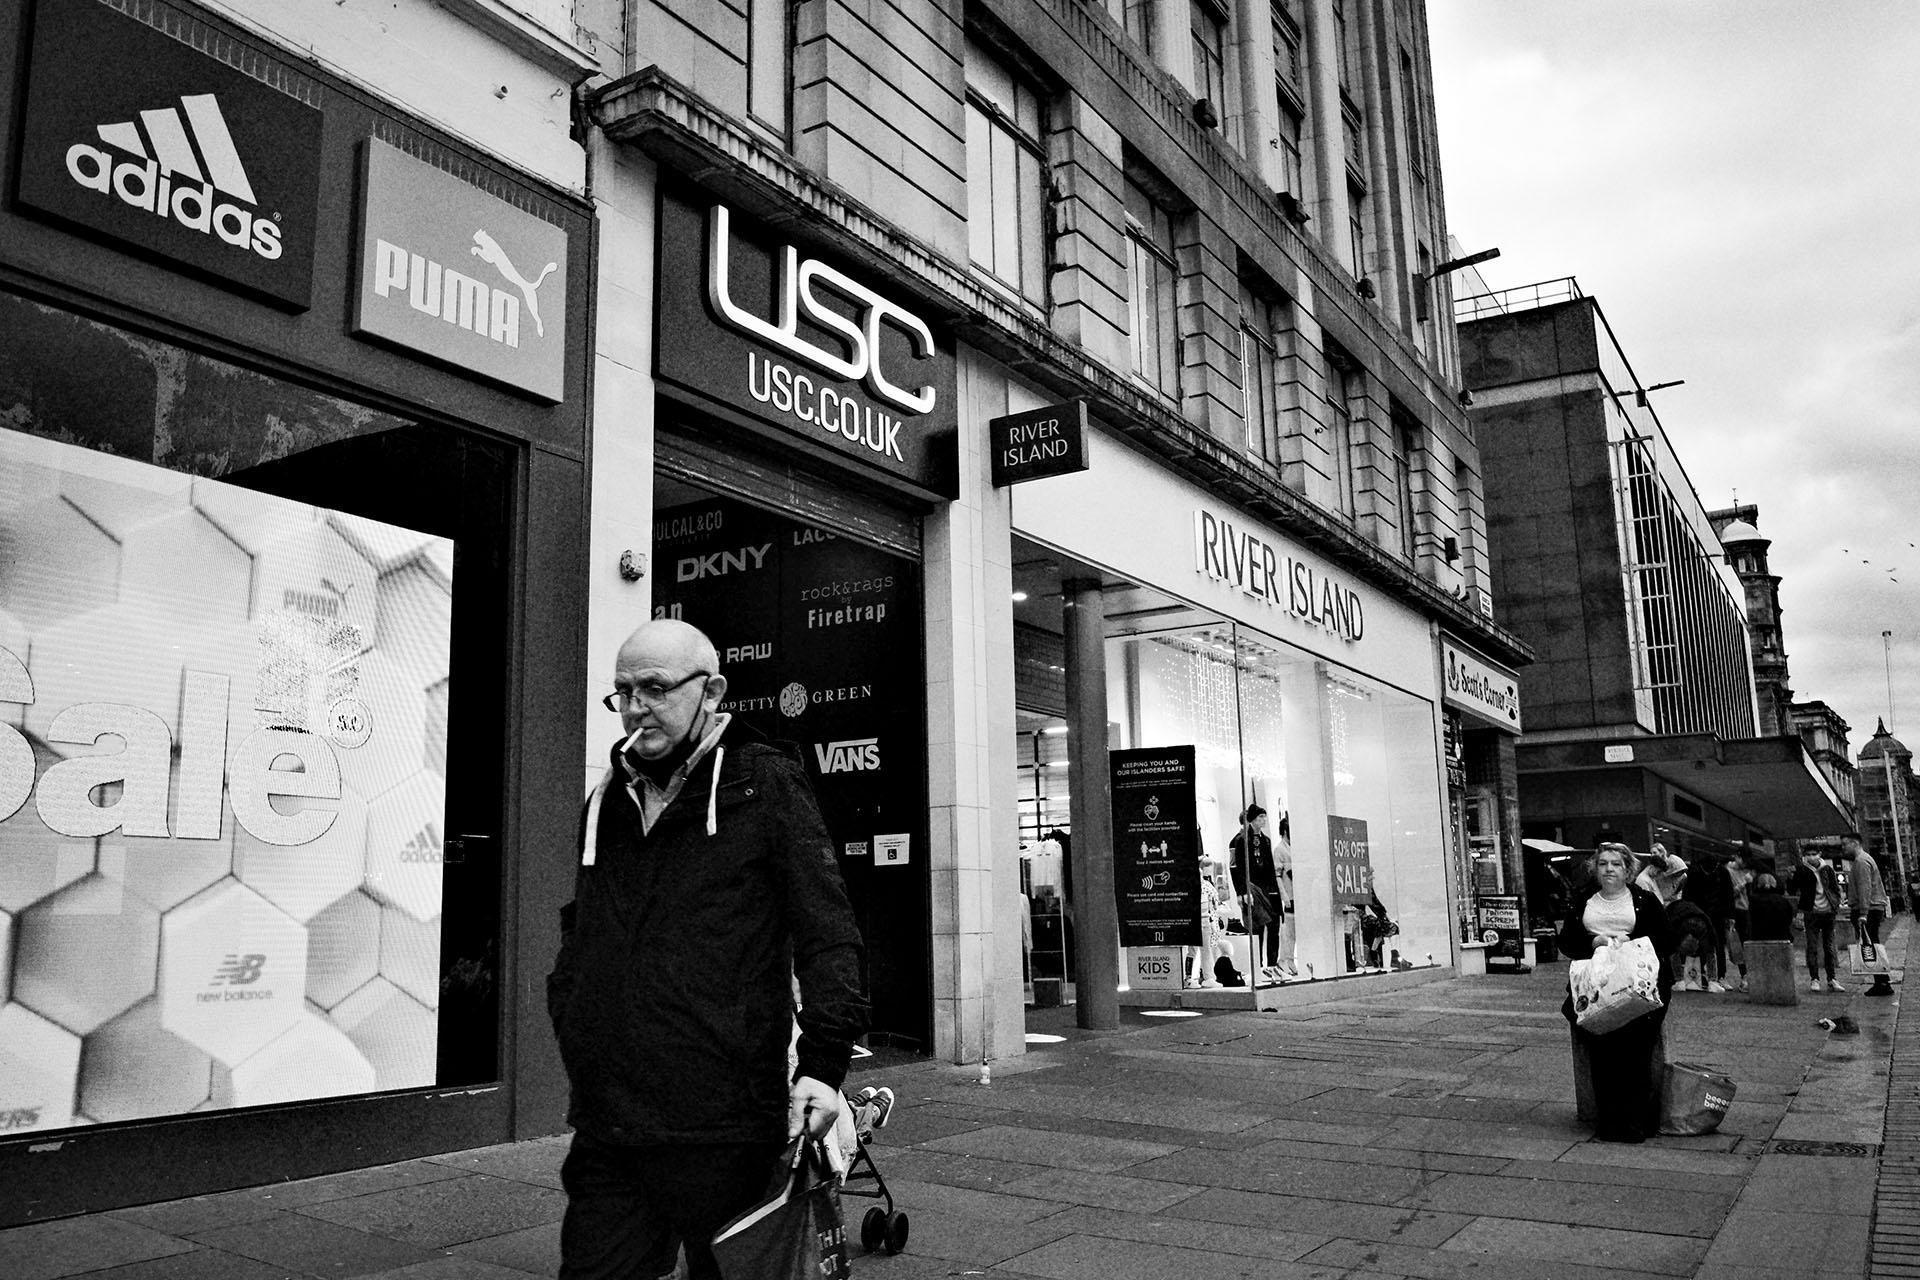 Glasgow street photograph